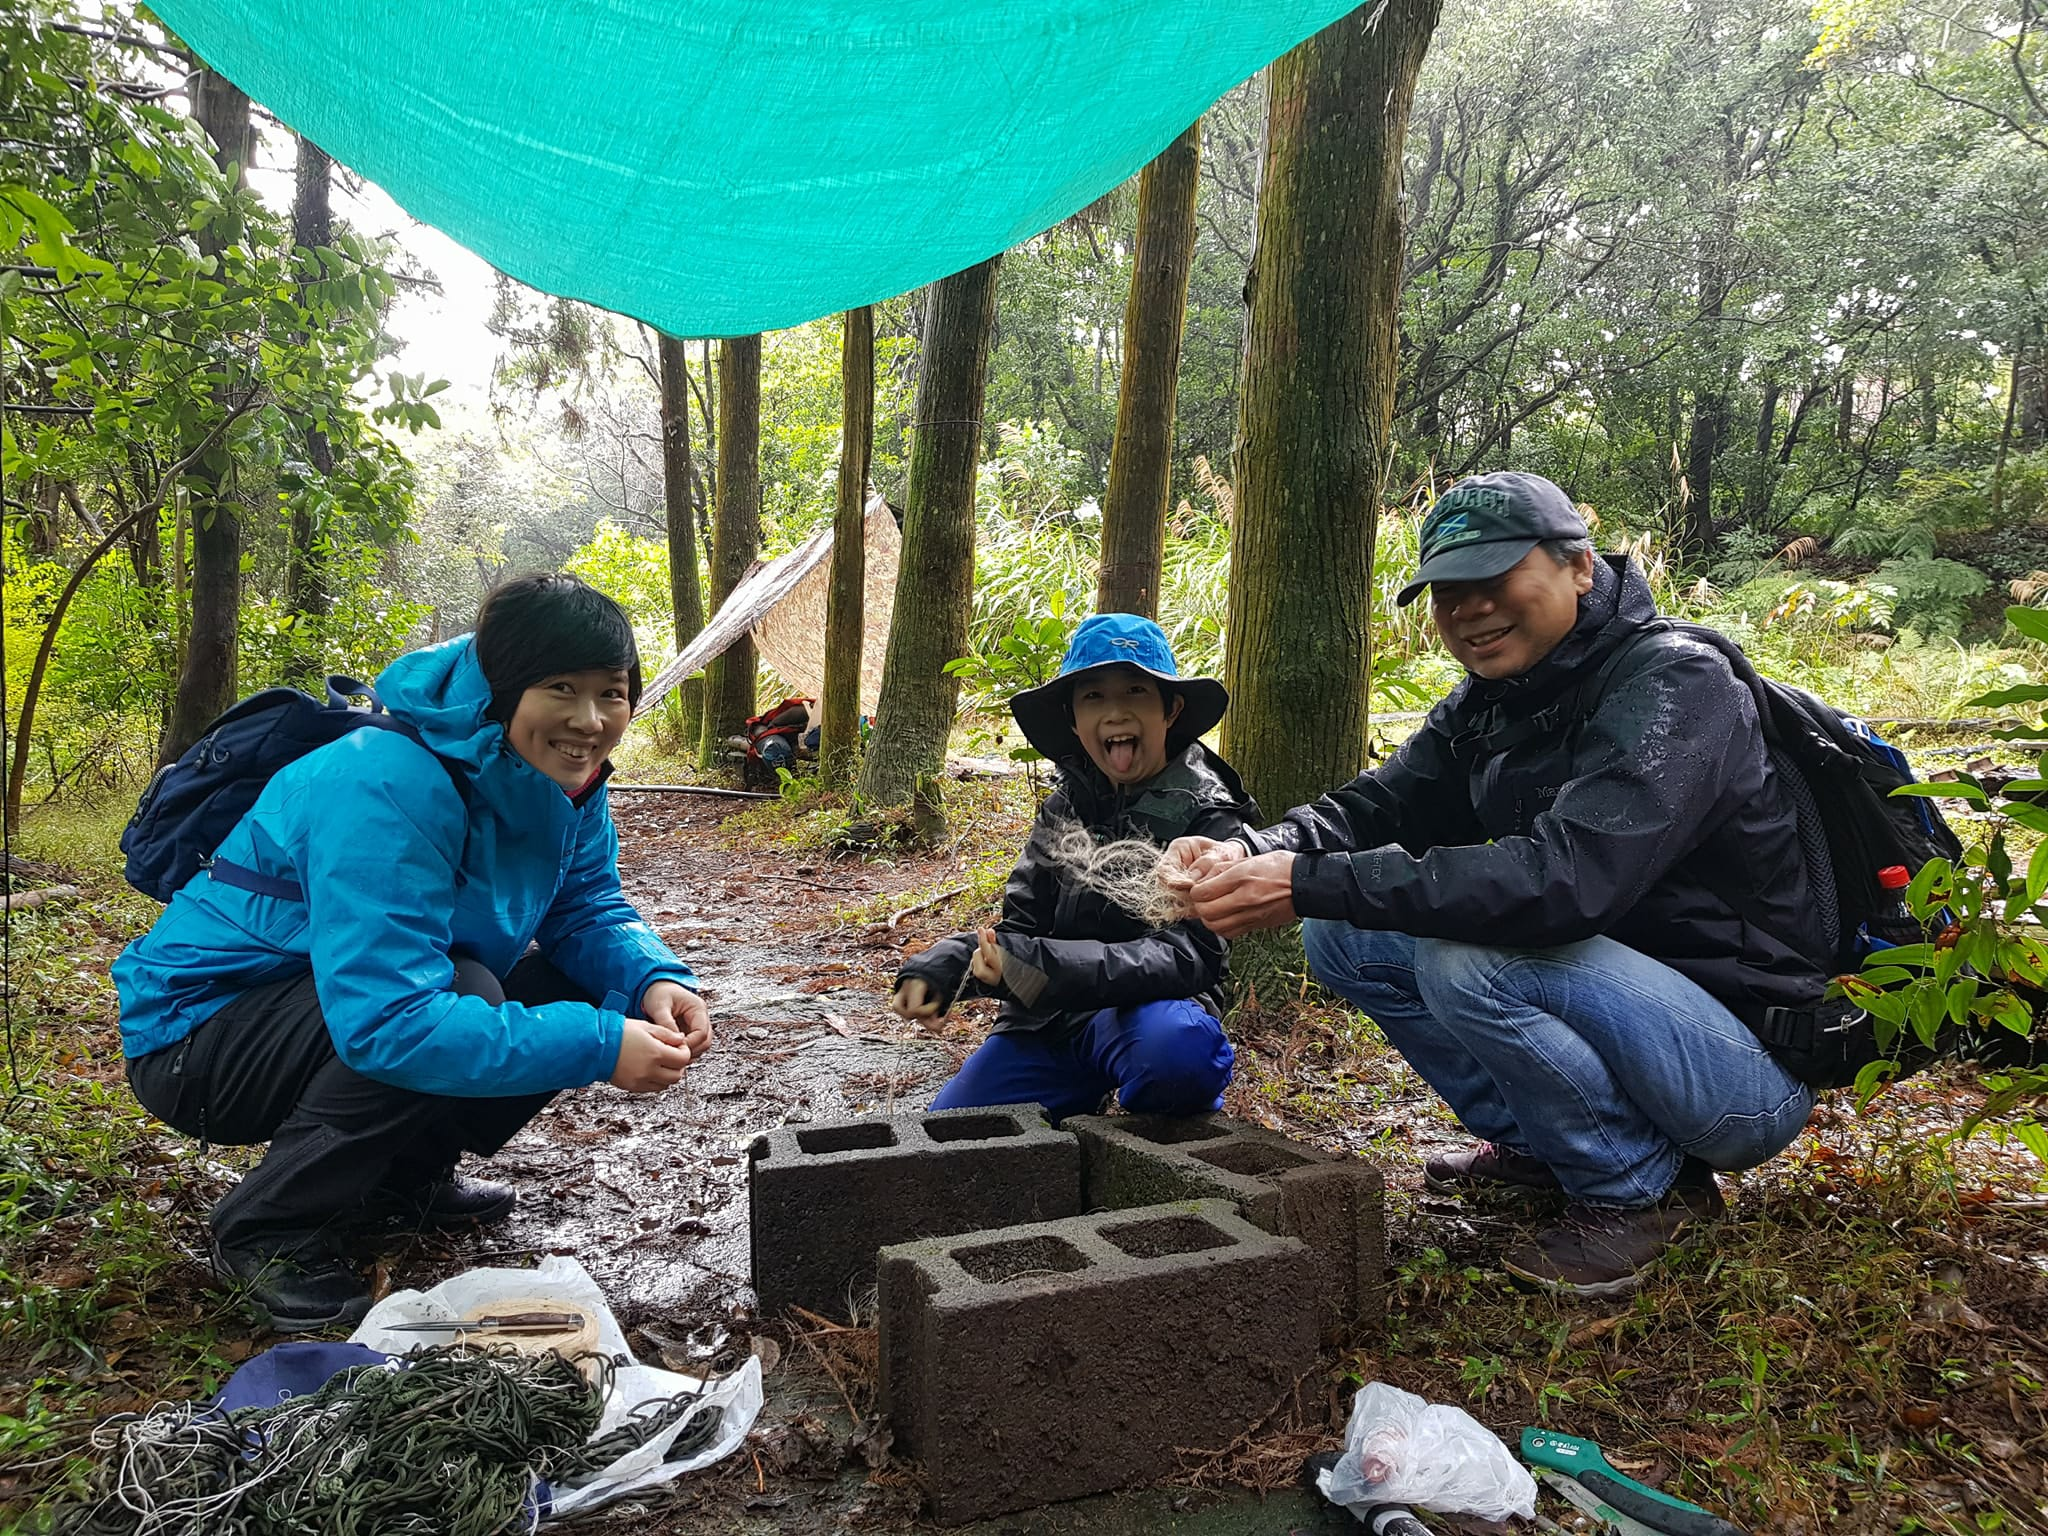 Family survival training trip